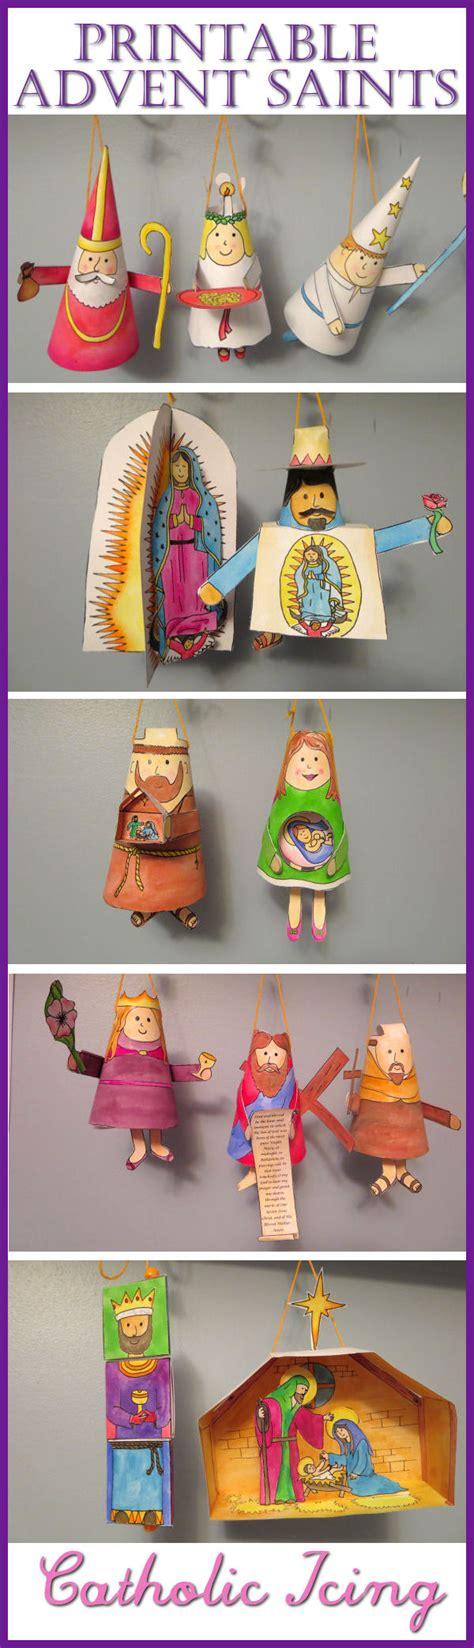 advent saints craft printable ornaments for catholic kids